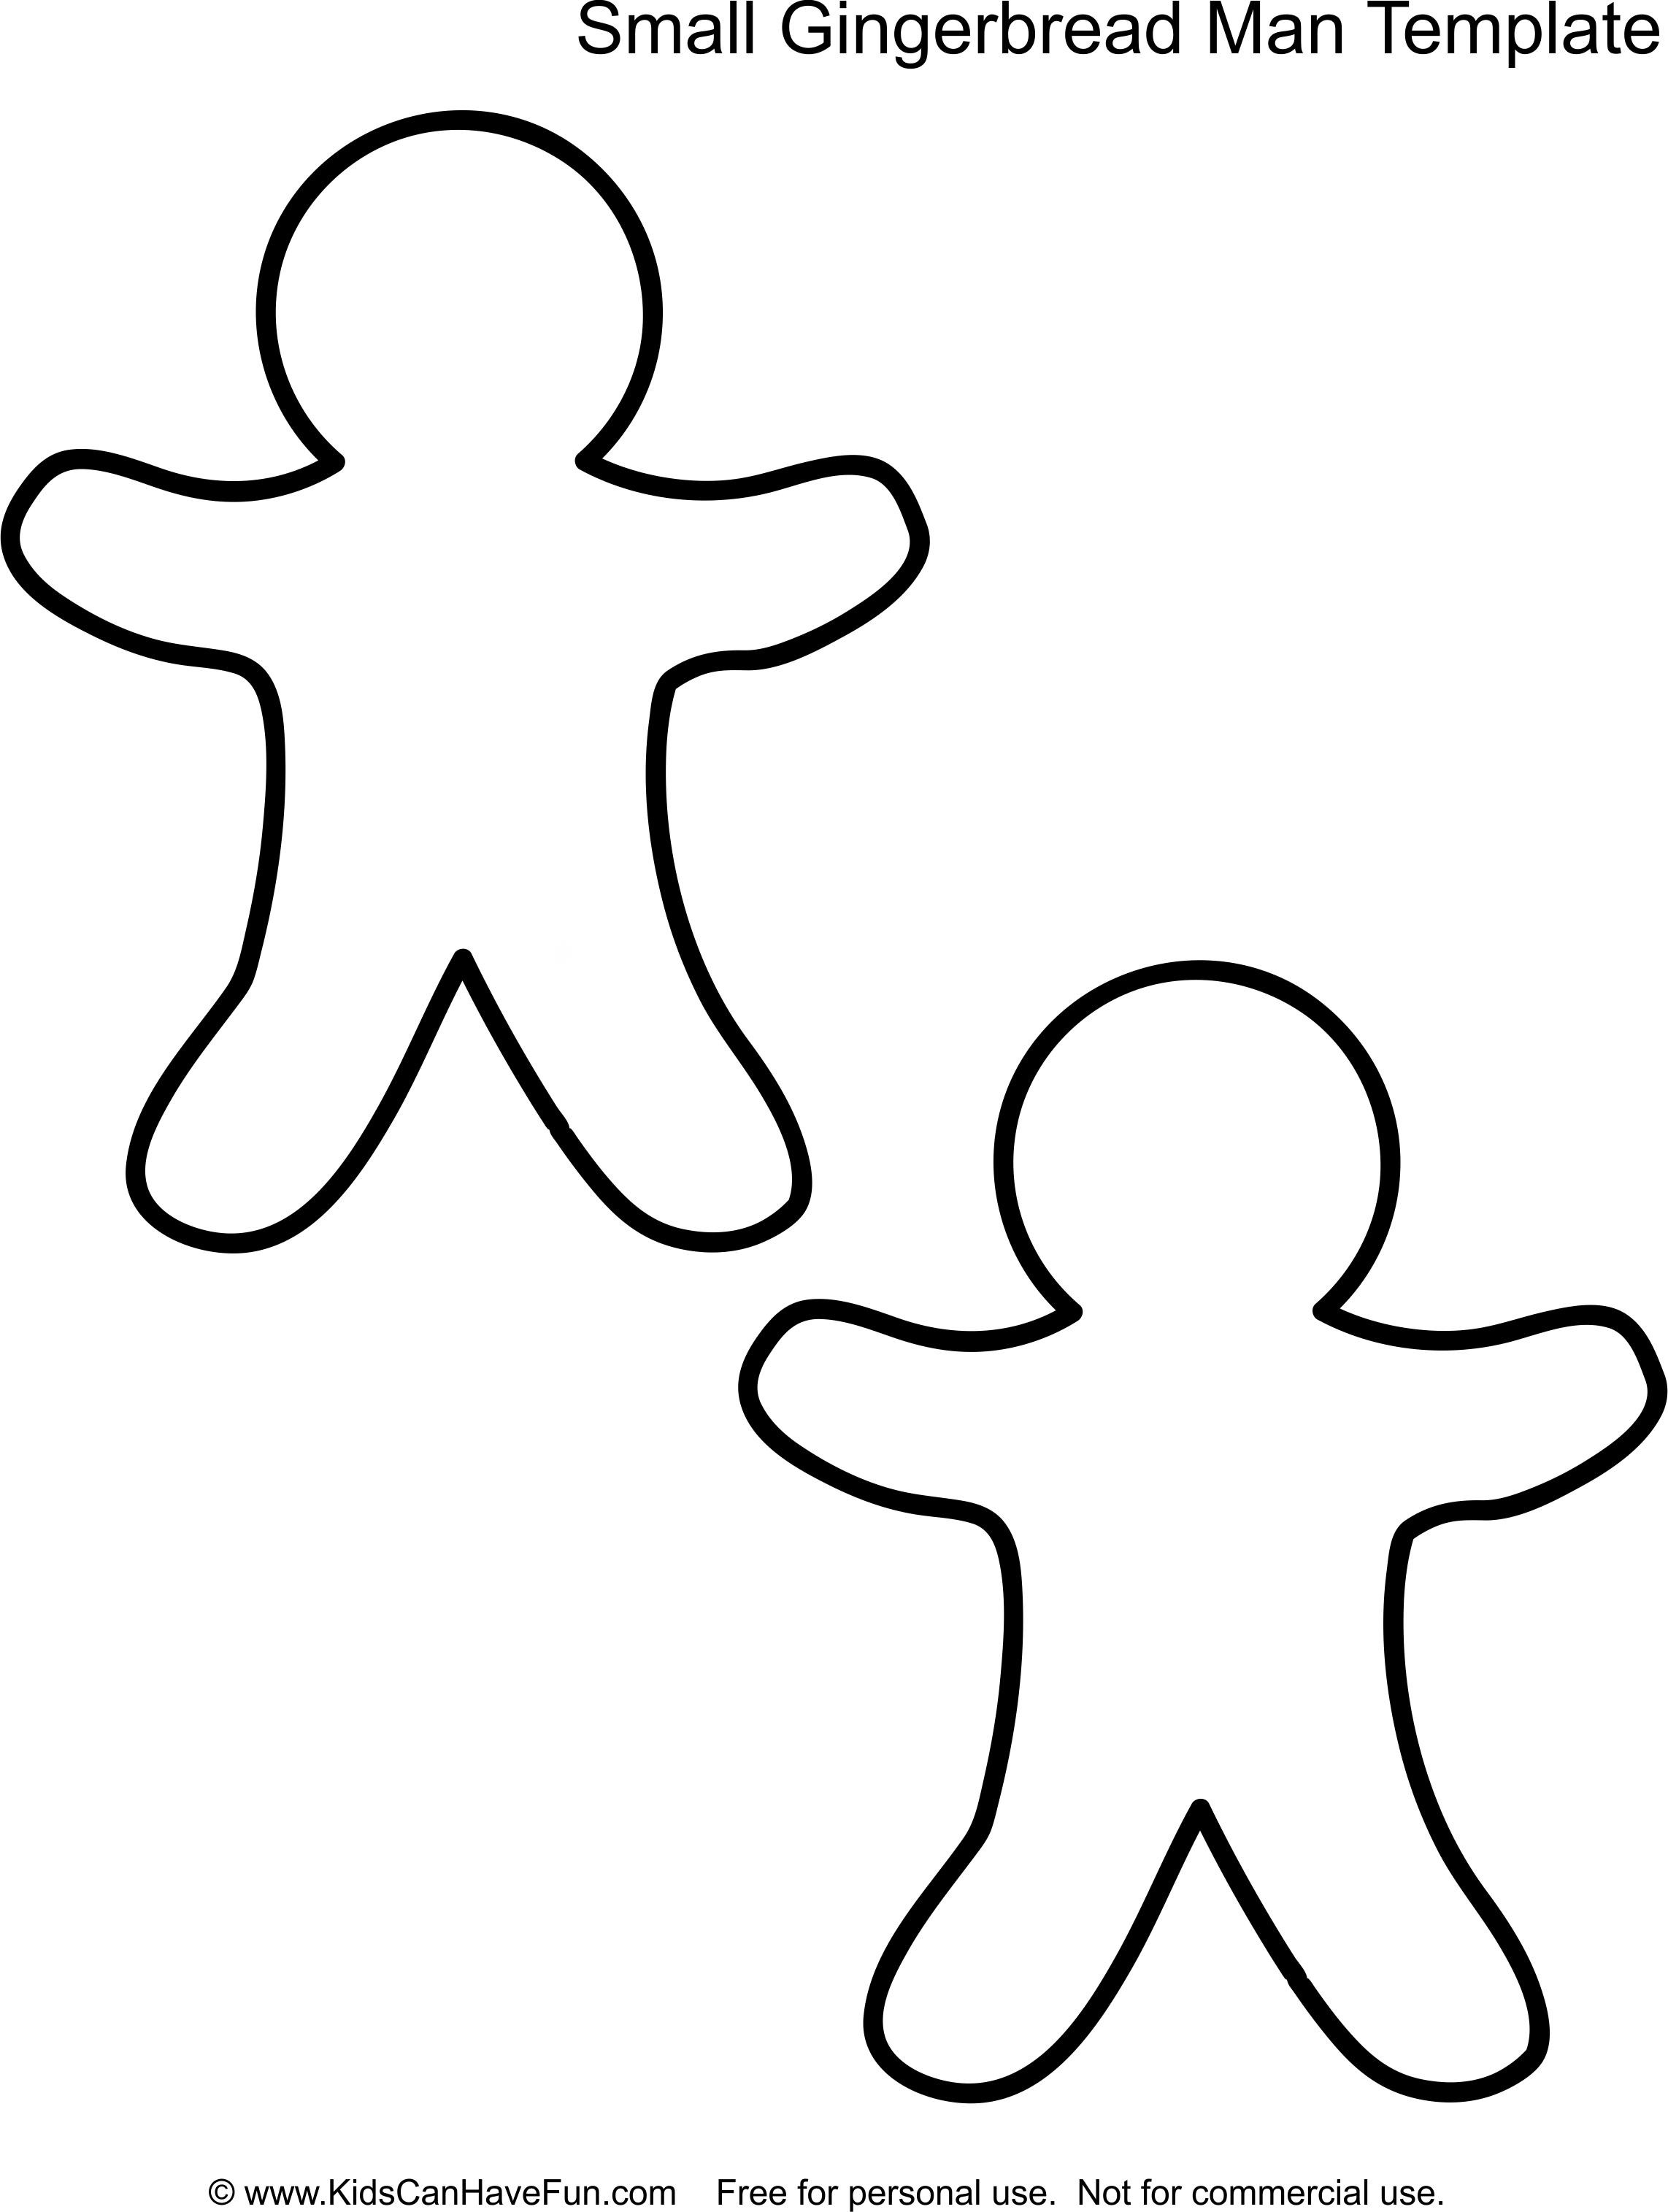 Small Gingerbread Man Template Http Www Kidscanhavefun Com Christmas Crafts Htm Diychristmas Christmas Crafts Christmas Crafts Diy Gingerbread Man Template